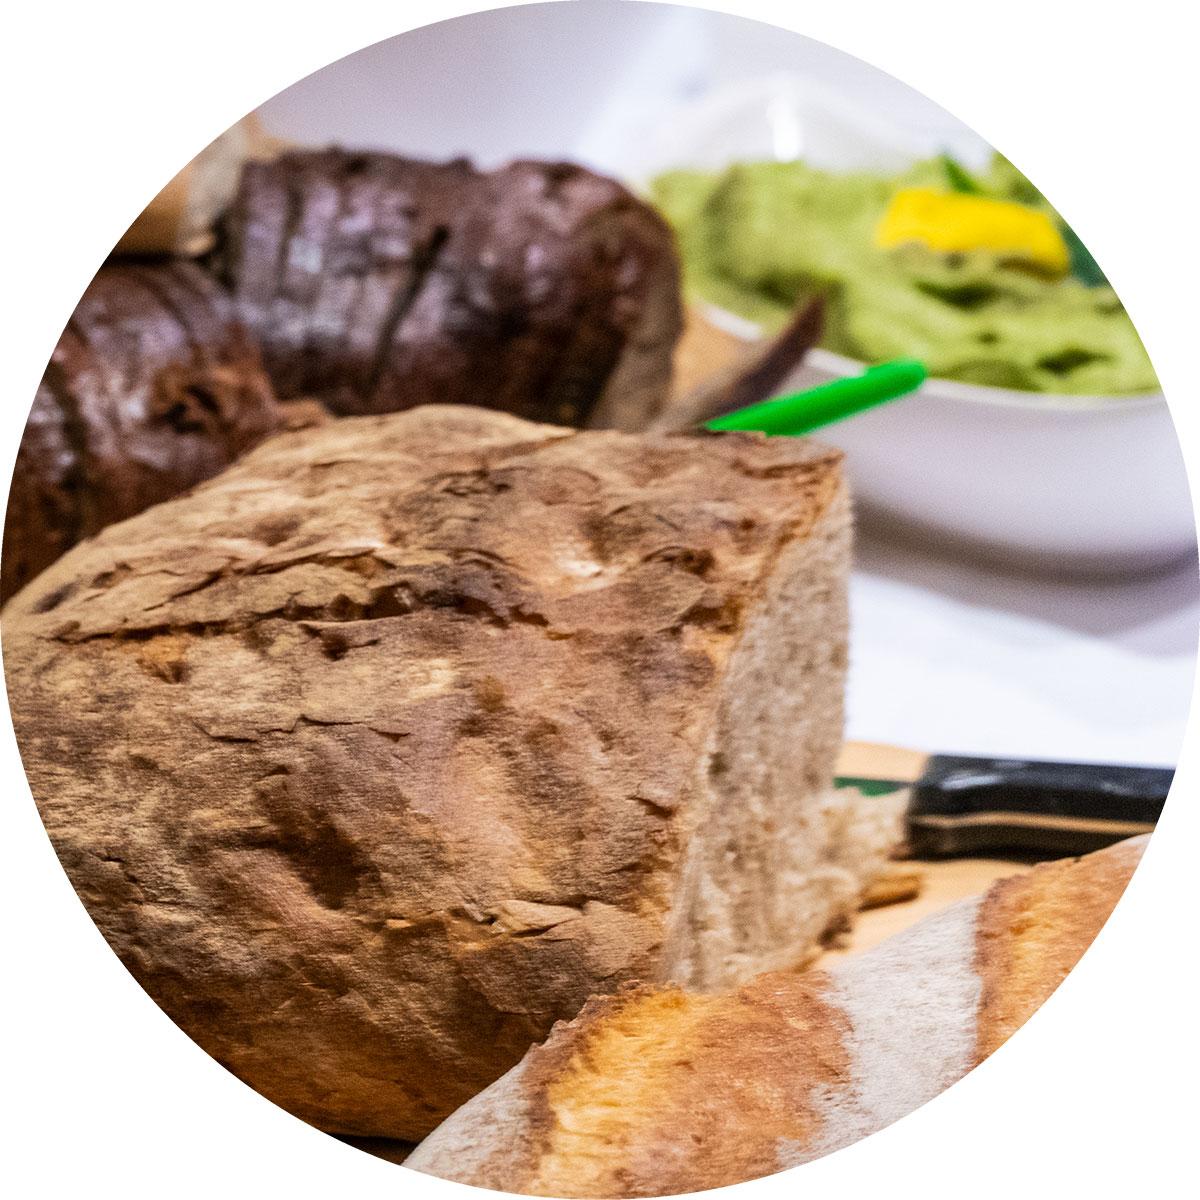 Brote und Dips